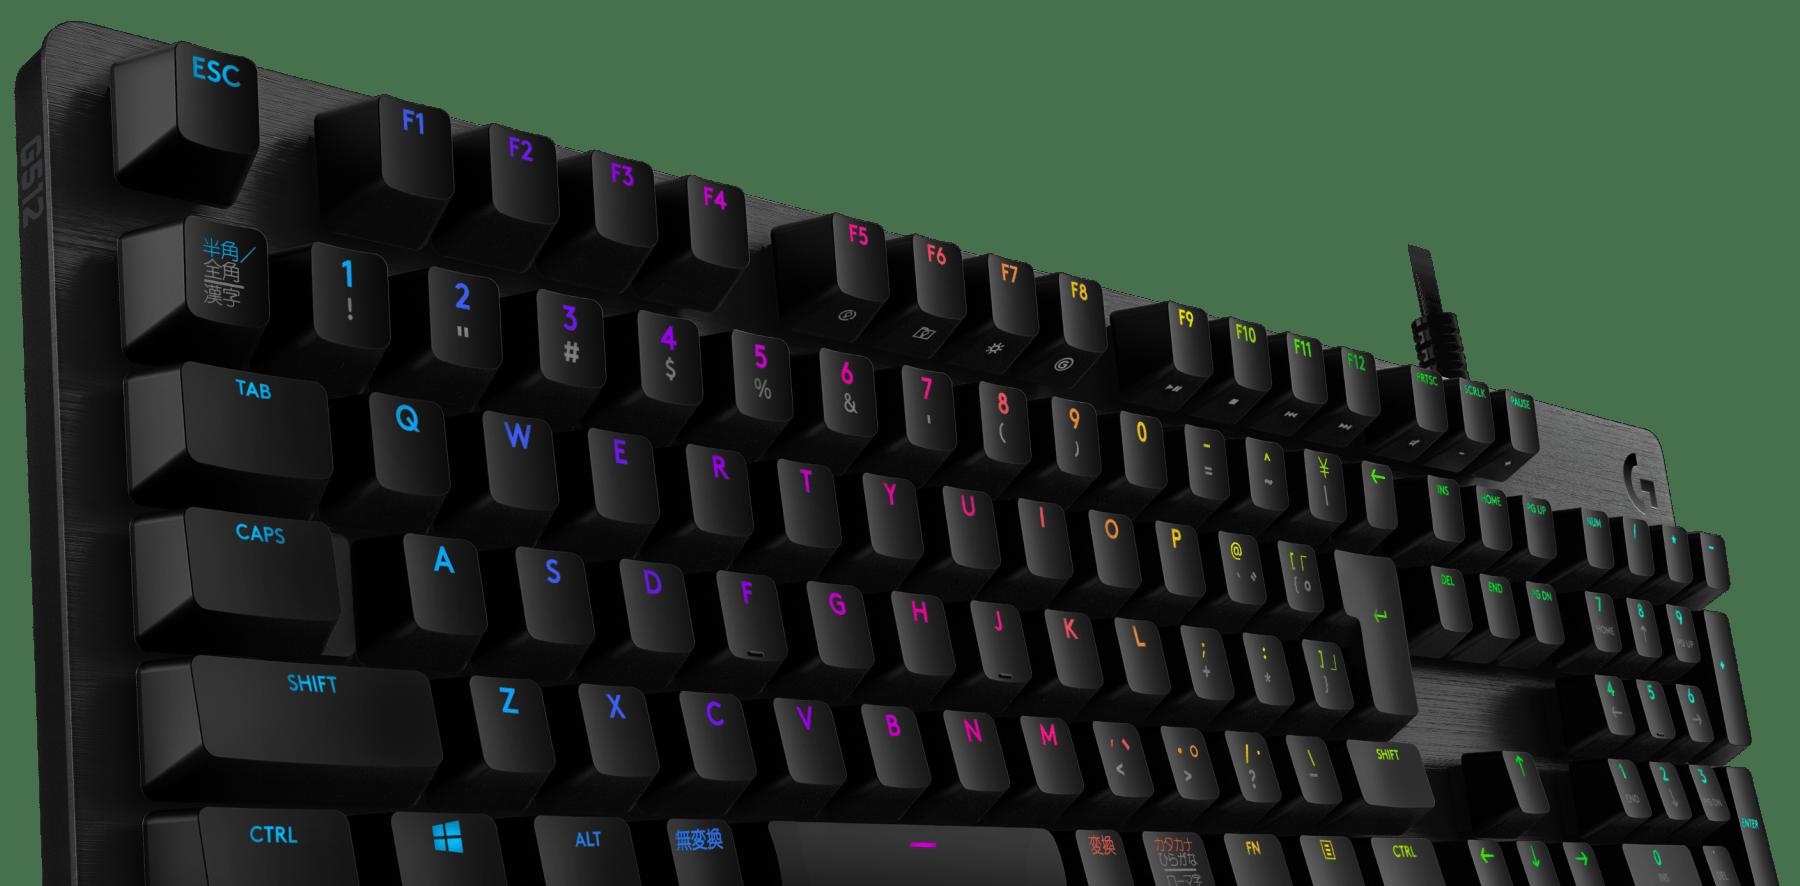 G512 LIGHTSYNC RGBメカニカル ゲーミング キーボード